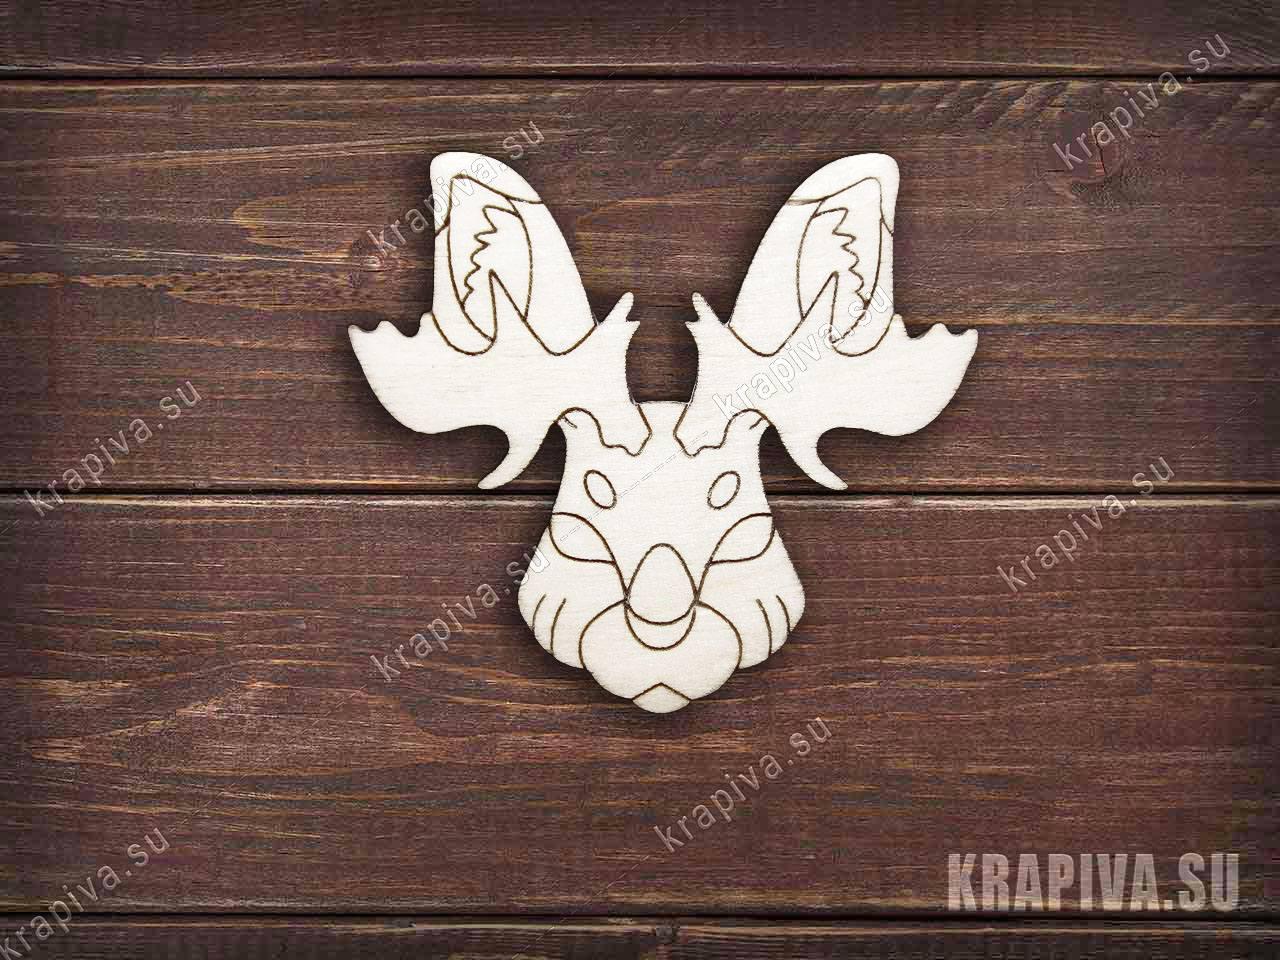 Снежный рогатый заготовка значка за 35 руб. в магазине Крапива (krapiva.su) (фото)